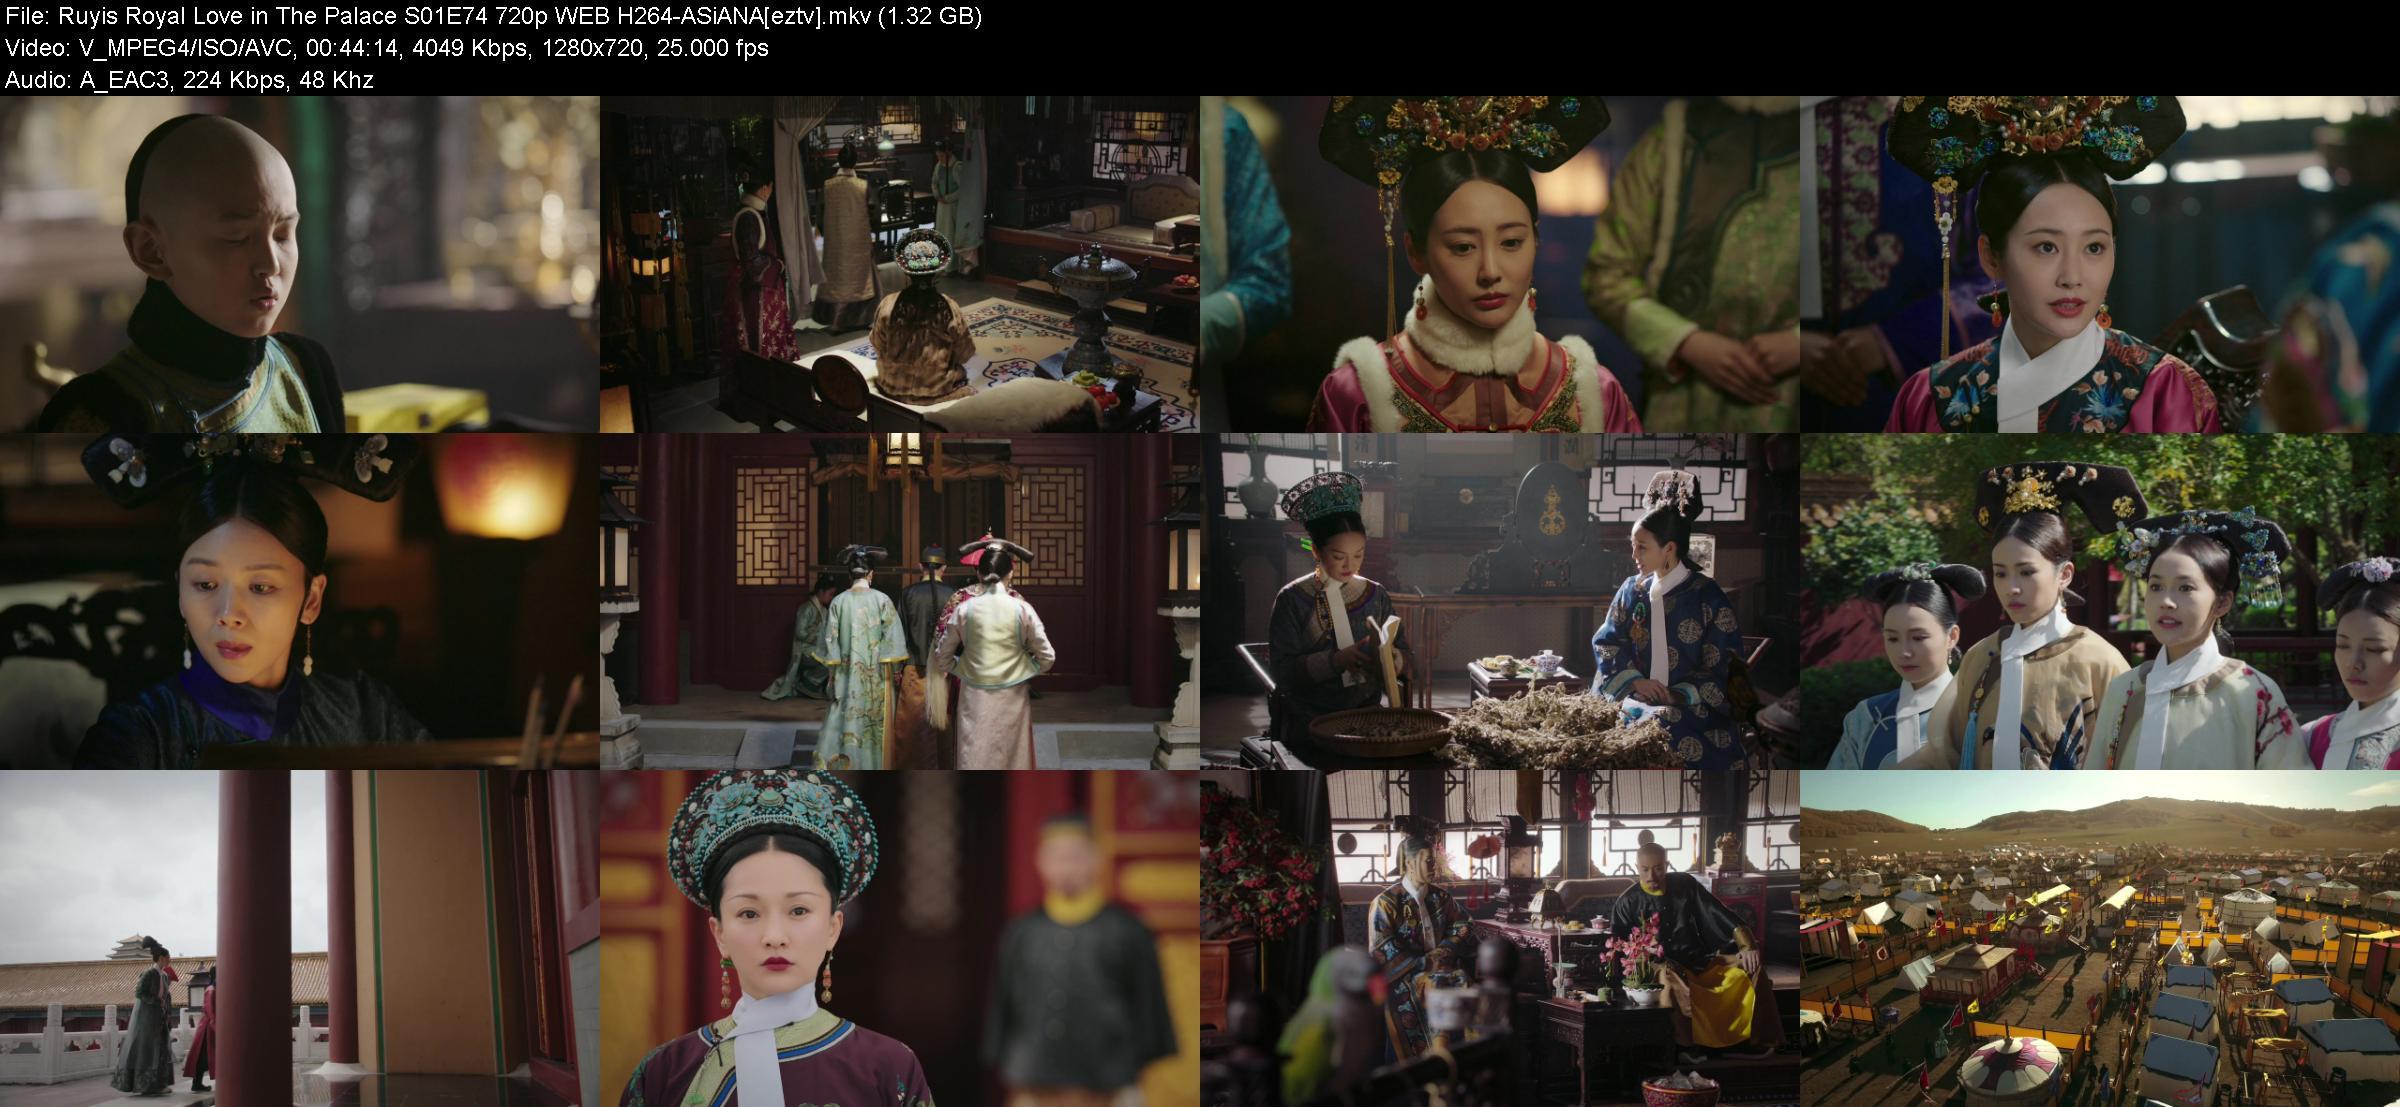 Ruyis Royal Love in The Palace S01E74 720p WEB H264-ASiANA